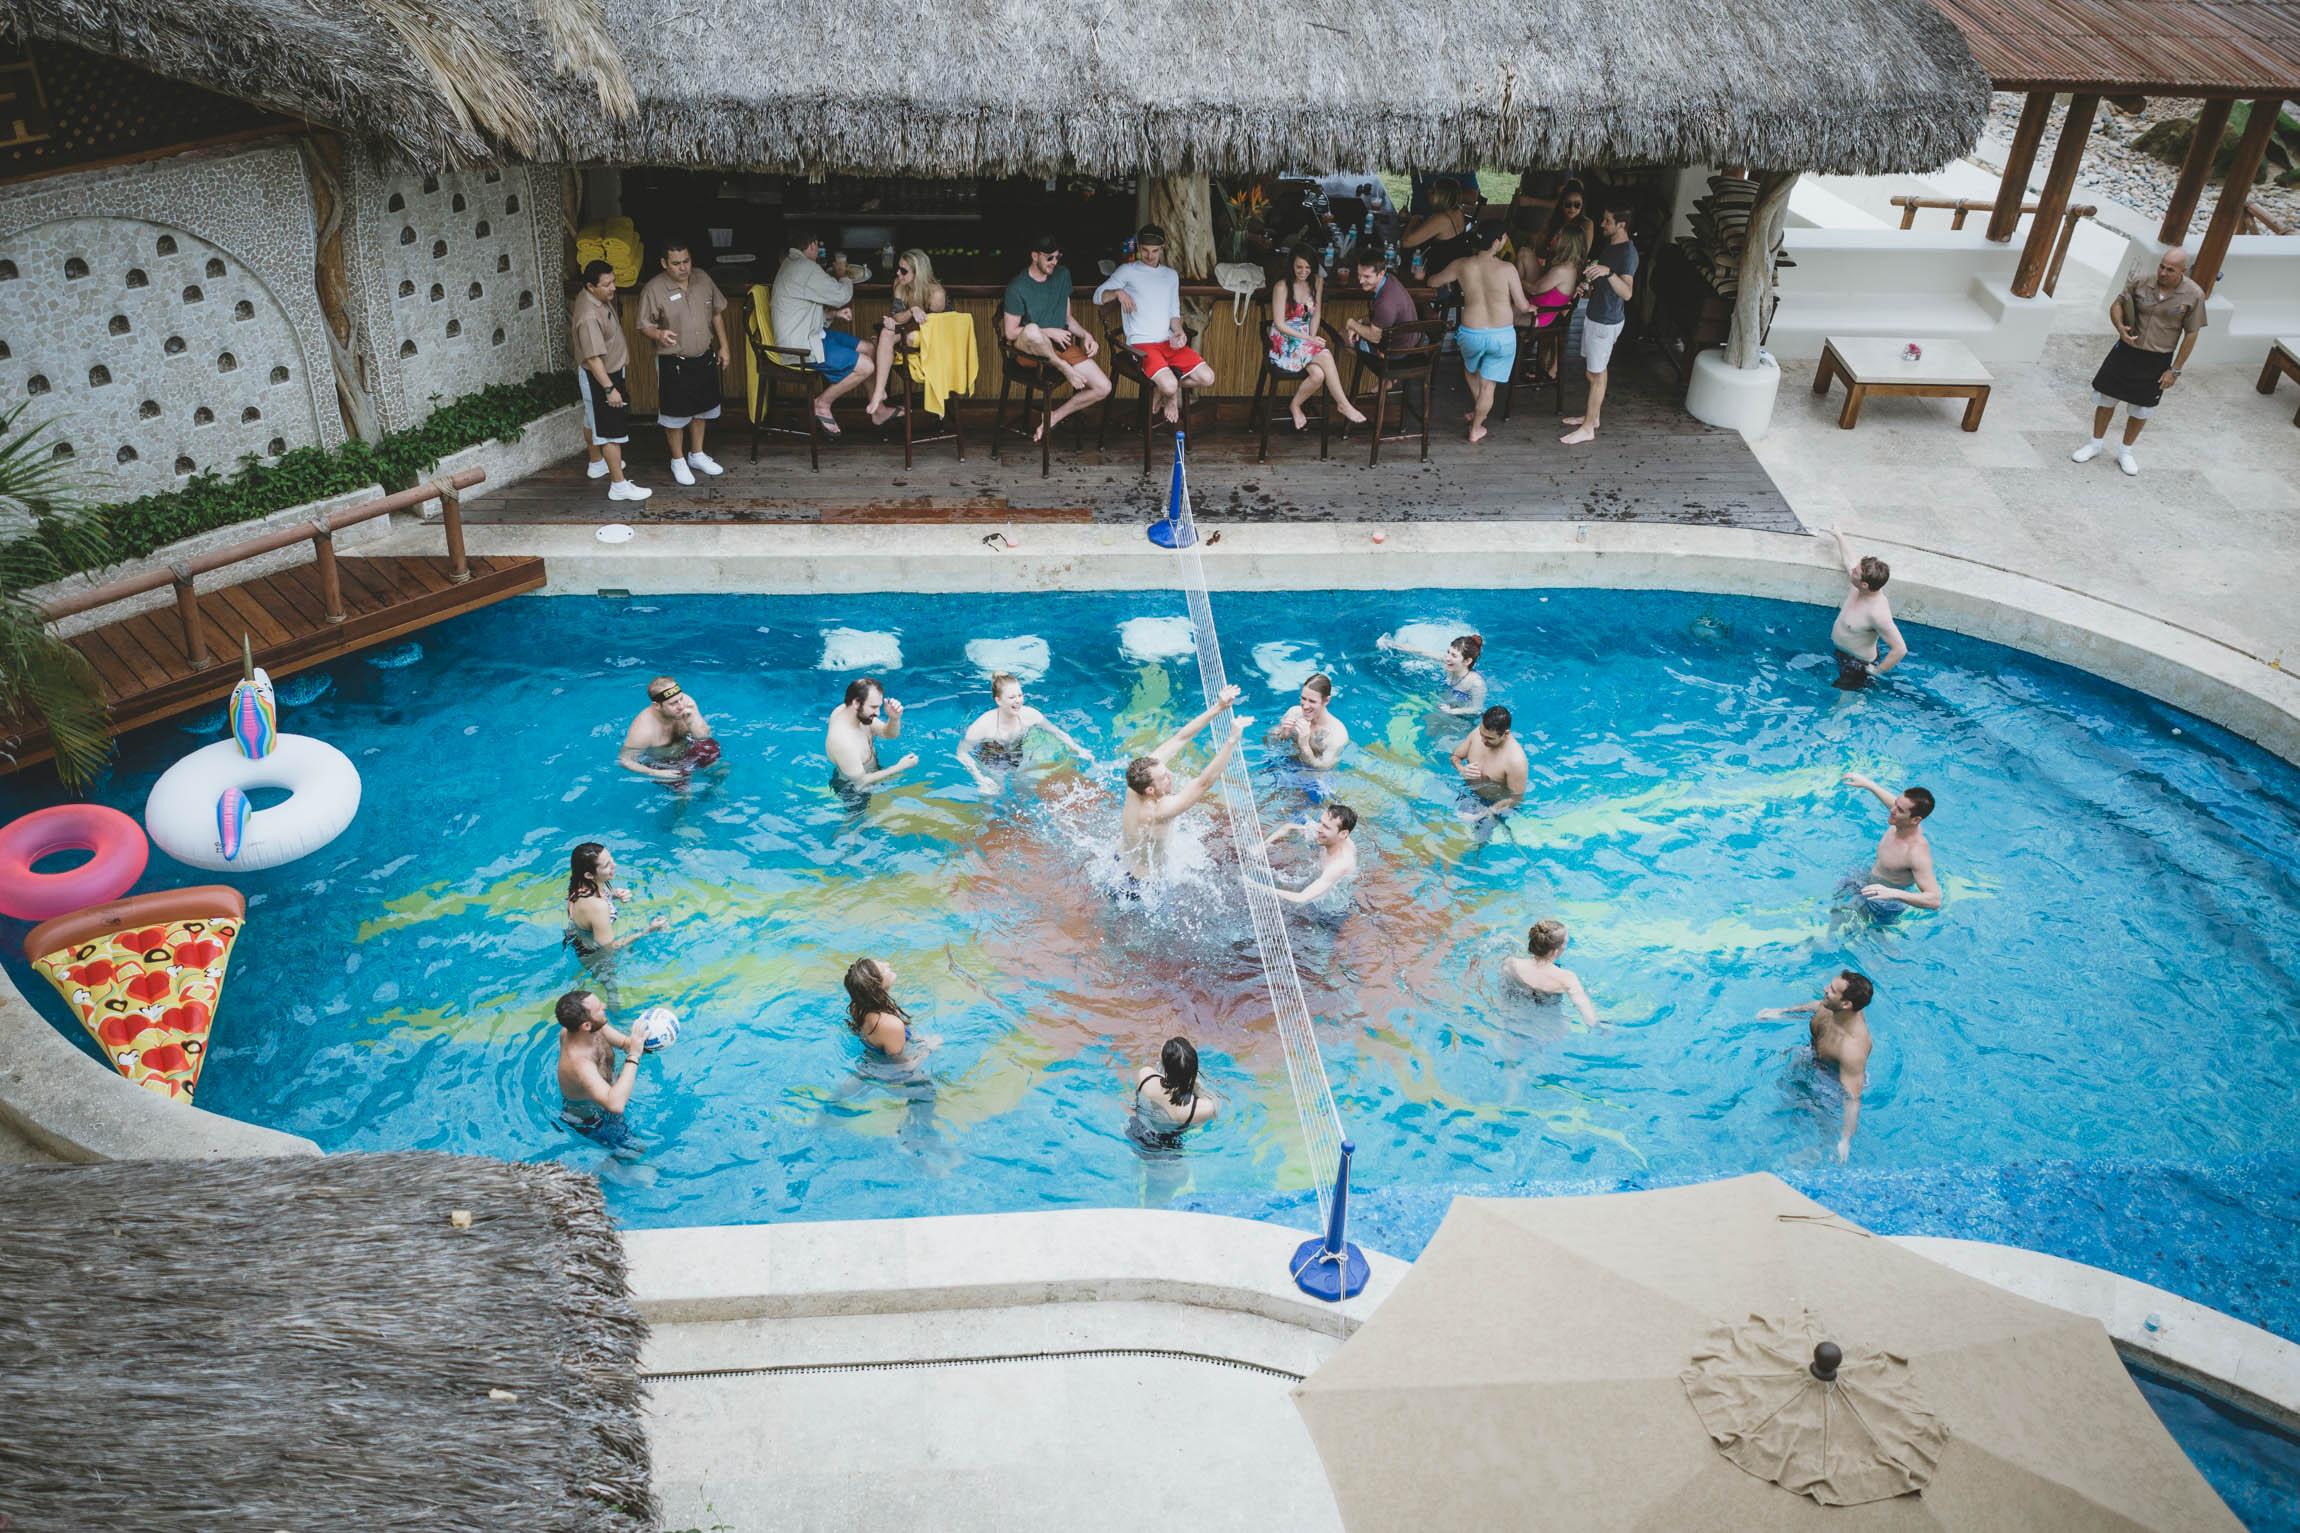 minnesota mexico destination wedding photographer-4.jpg